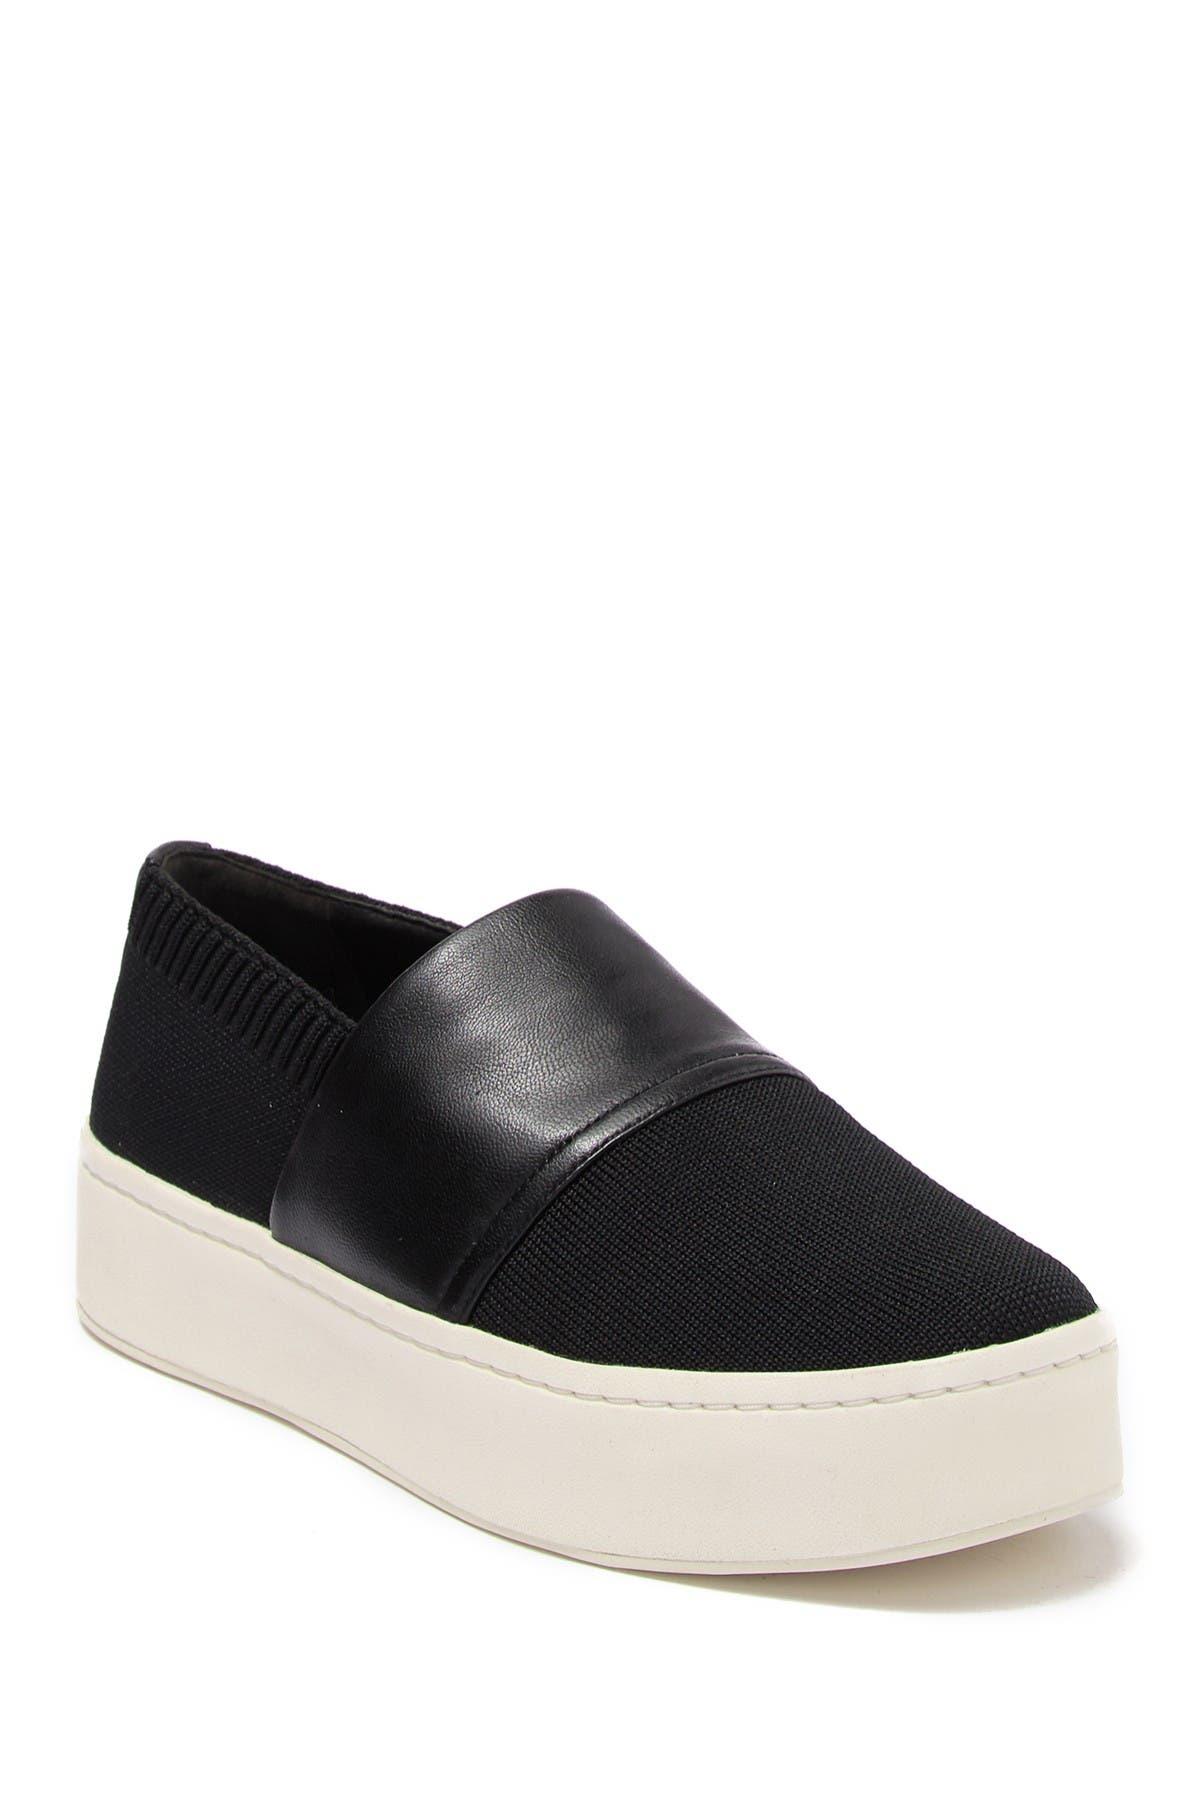 Ward Knit Slip-On Platform Sneaker